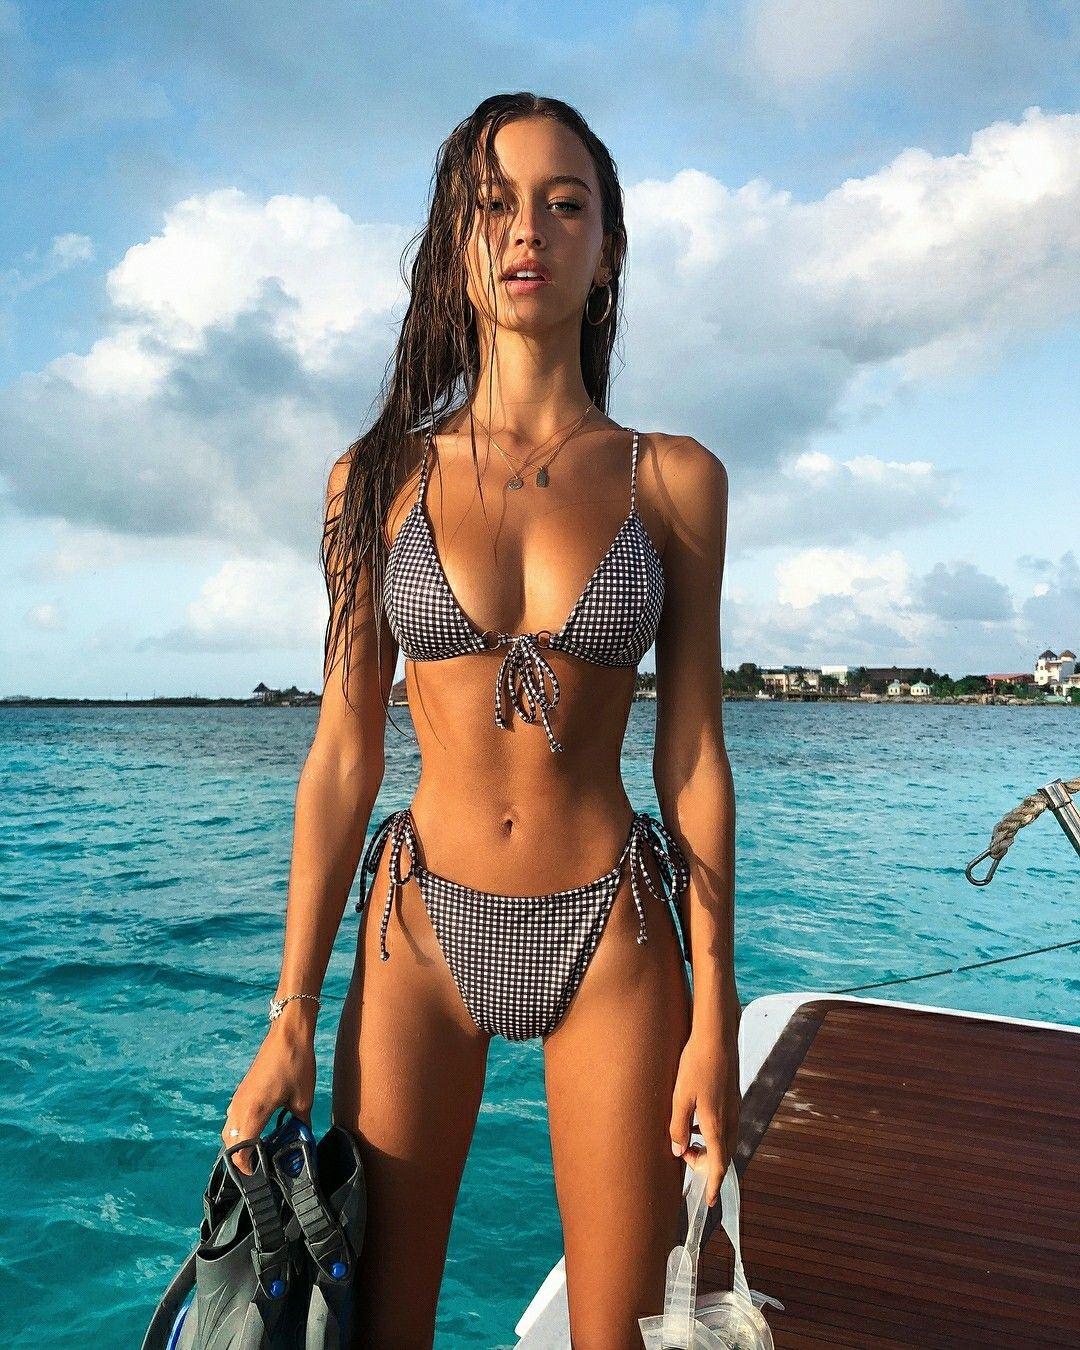 Thigh Gap Bikini Babe